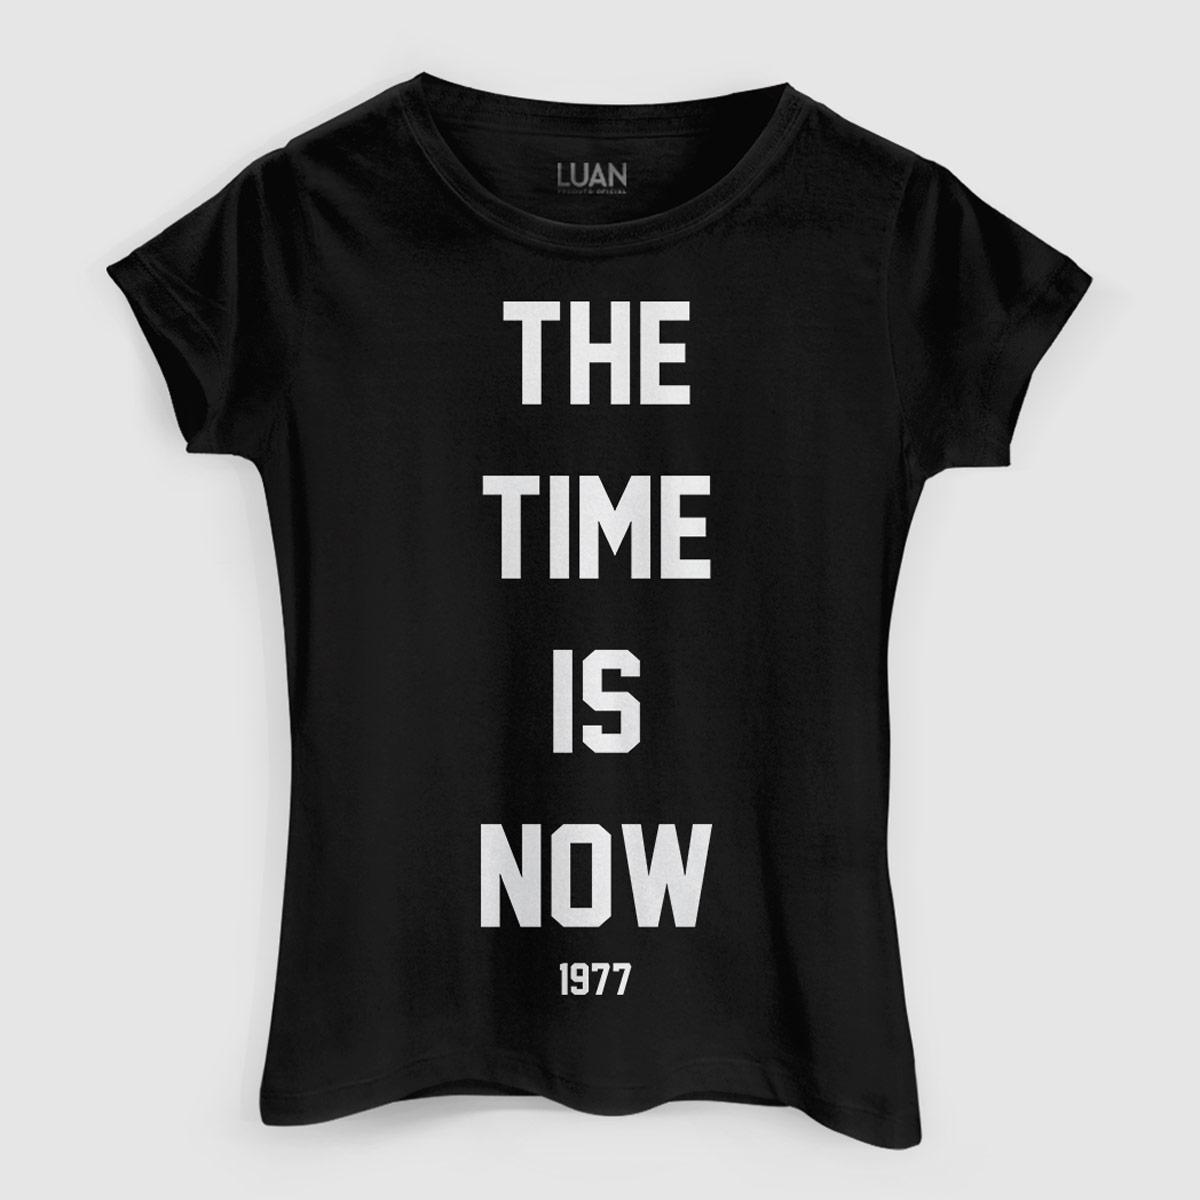 Camiseta Feminina Luan Santana The Time Is Now